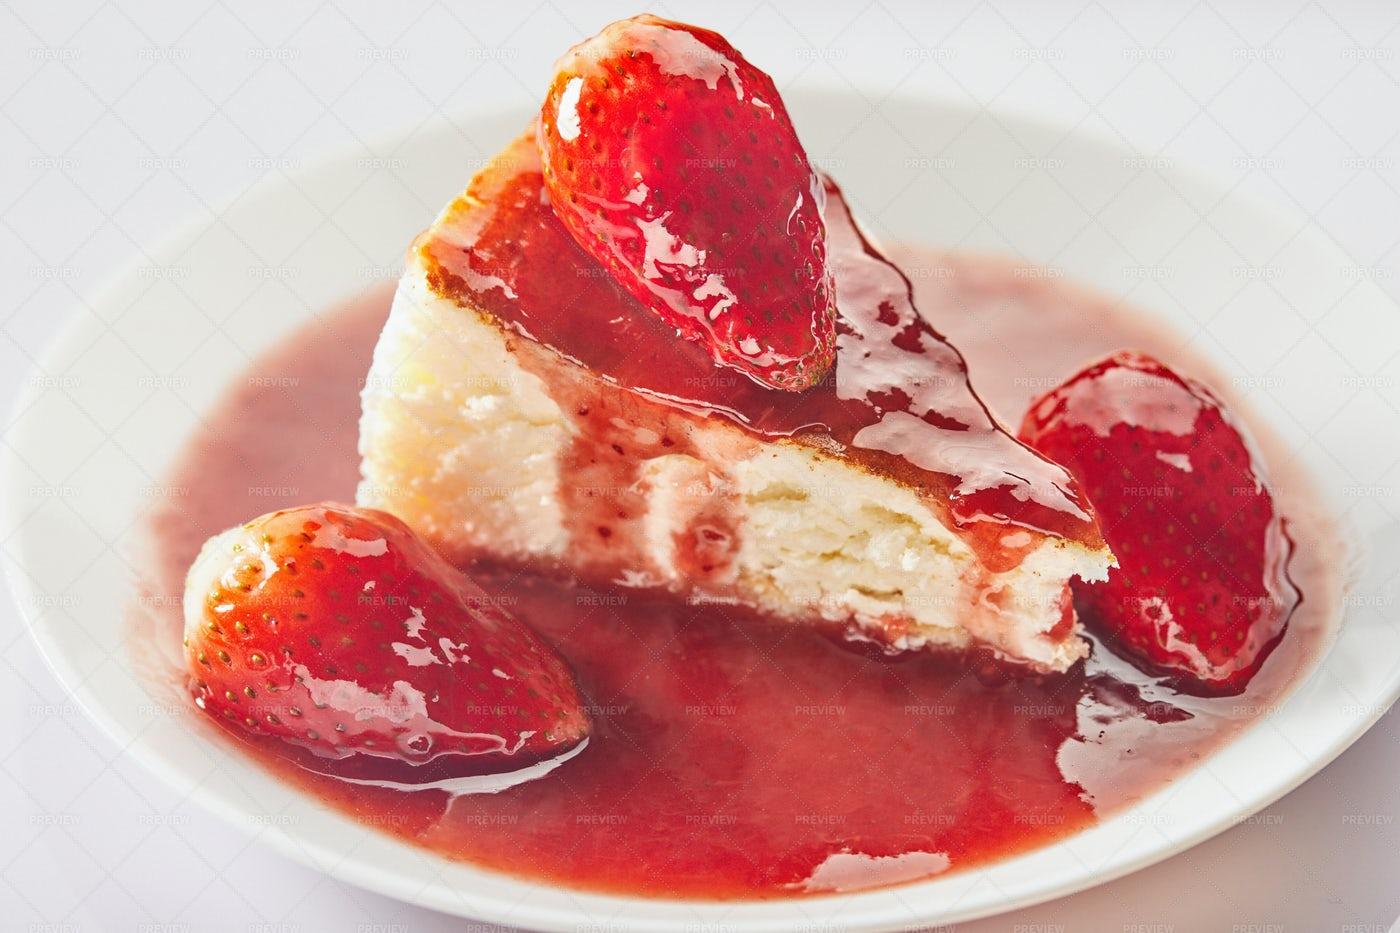 Cheesecake And Strawberry Jam: Stock Photos